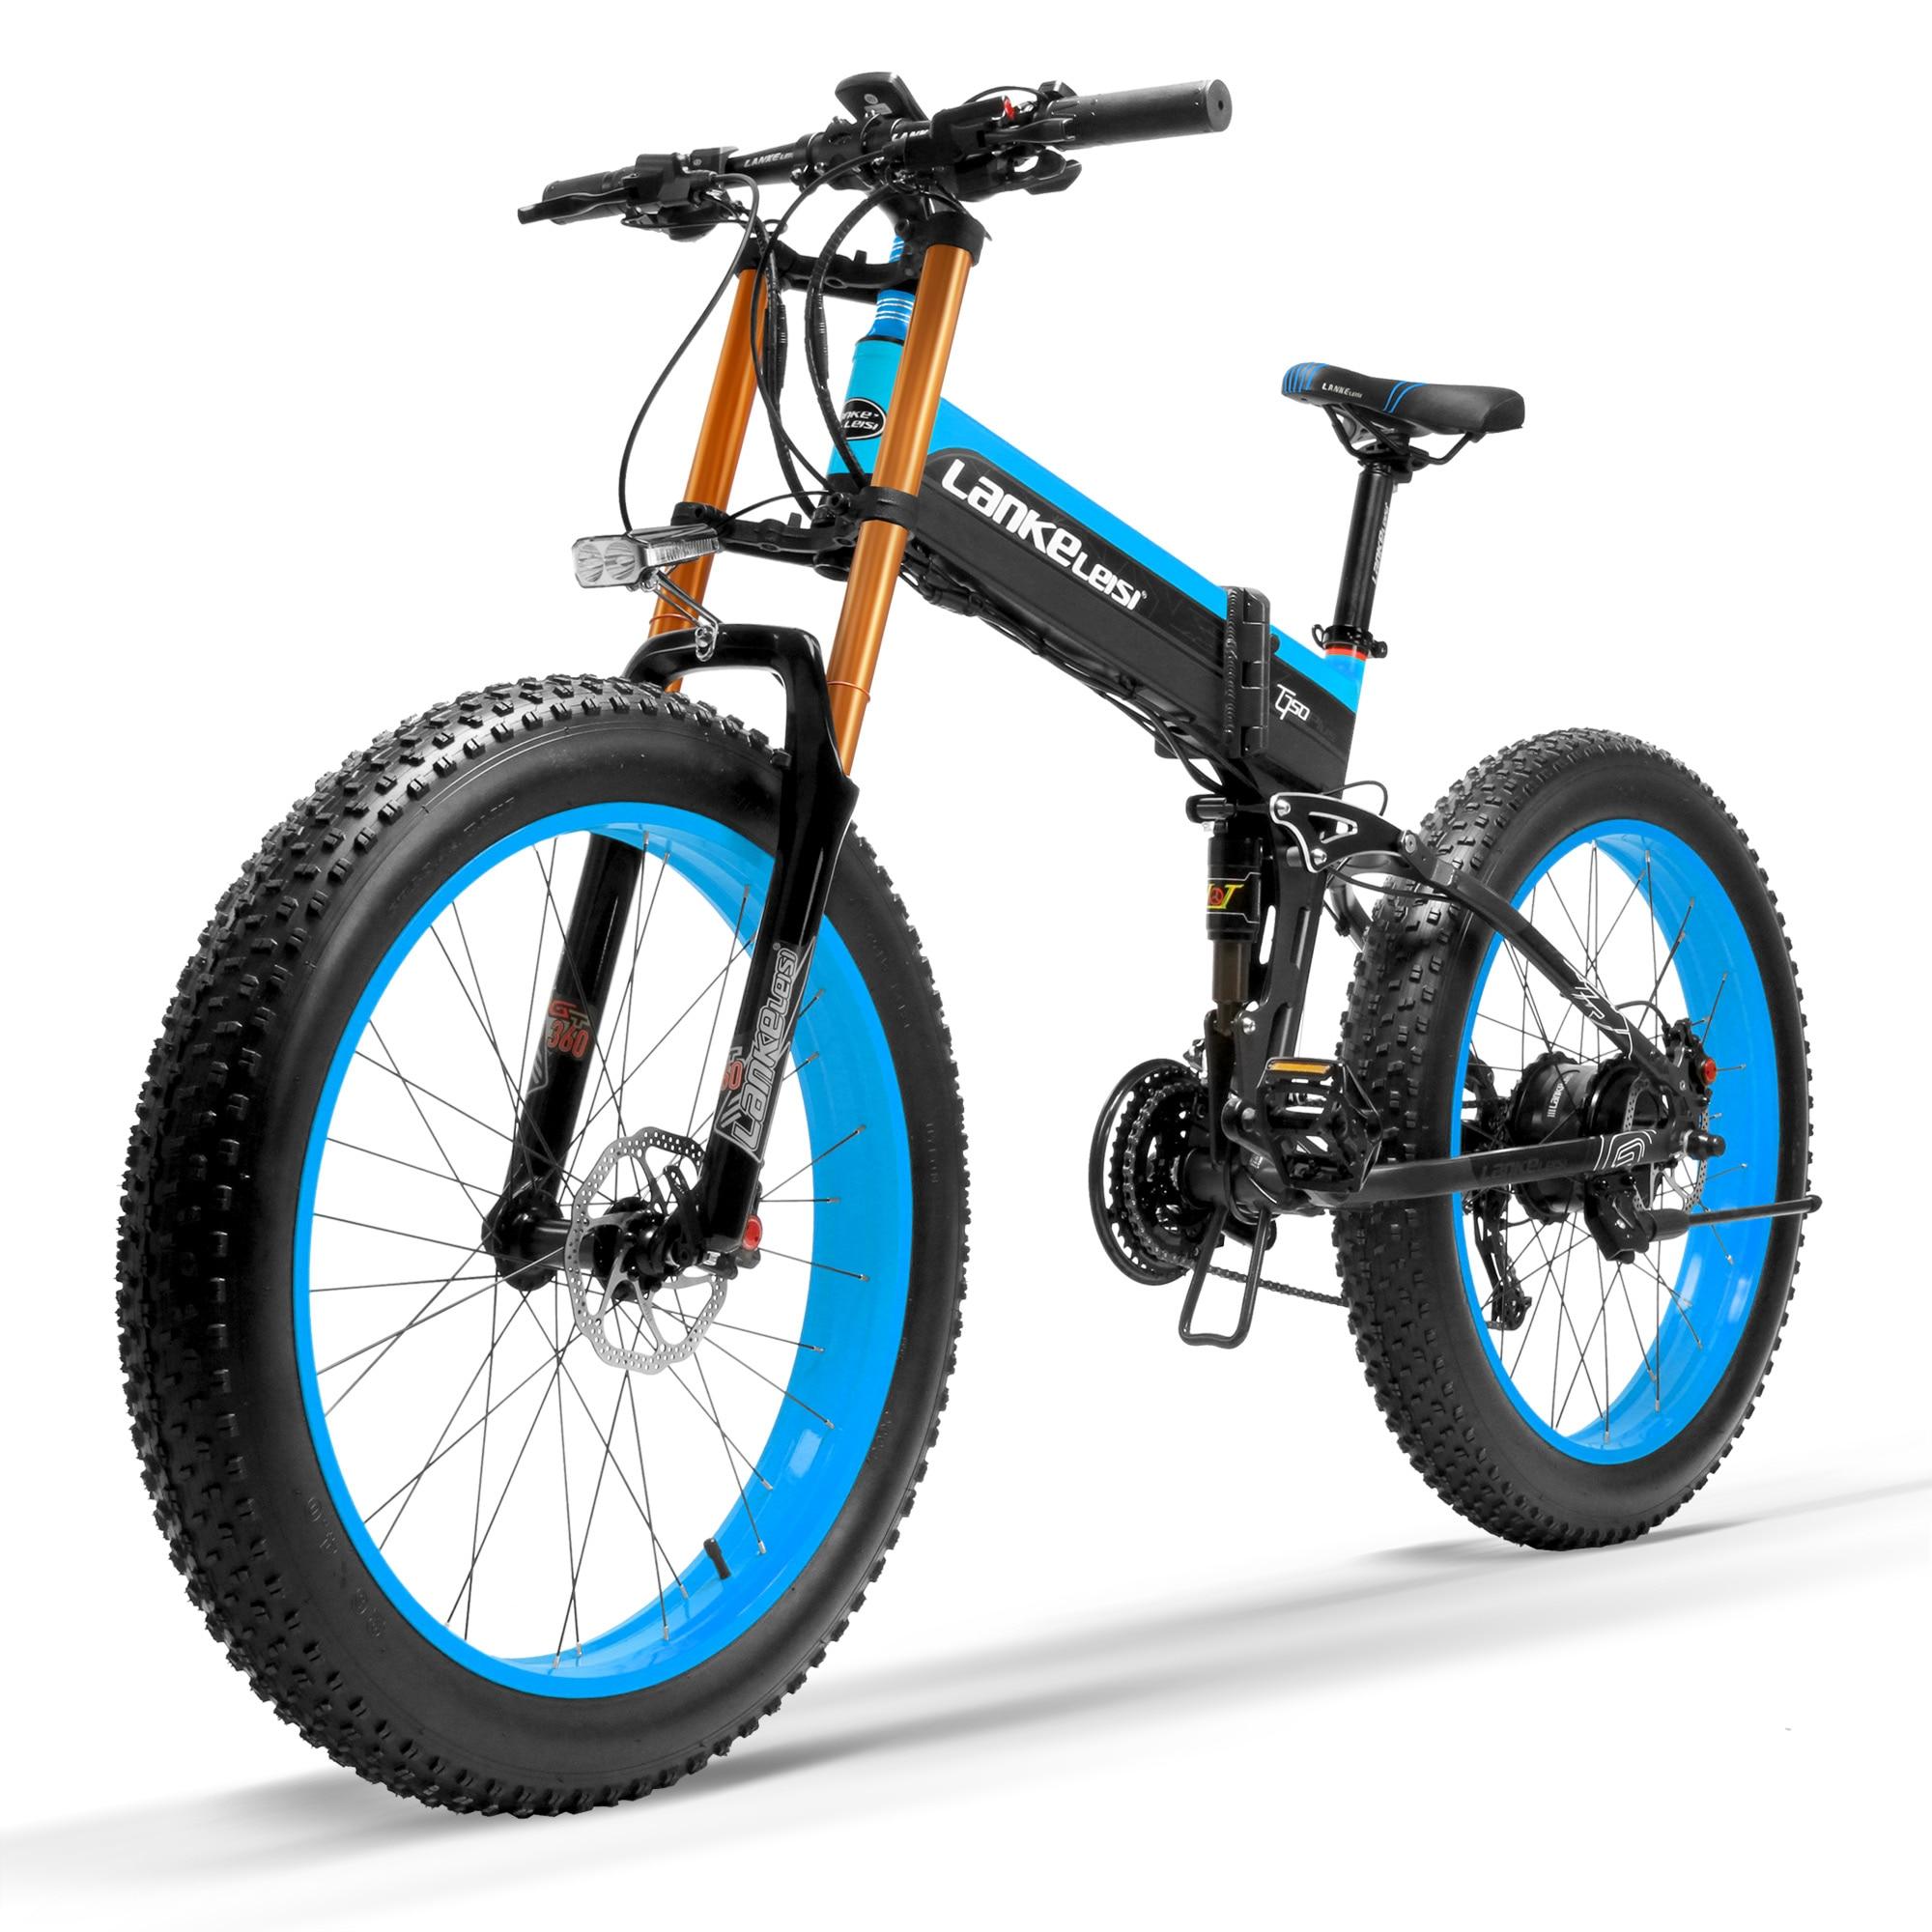 T750Plus Folding Electric Bike, 48V 10A/14.5A Li-ion Battery,1000W Powerful Motor 5 Level Pedal Assist Sensor,Upgraded Fork